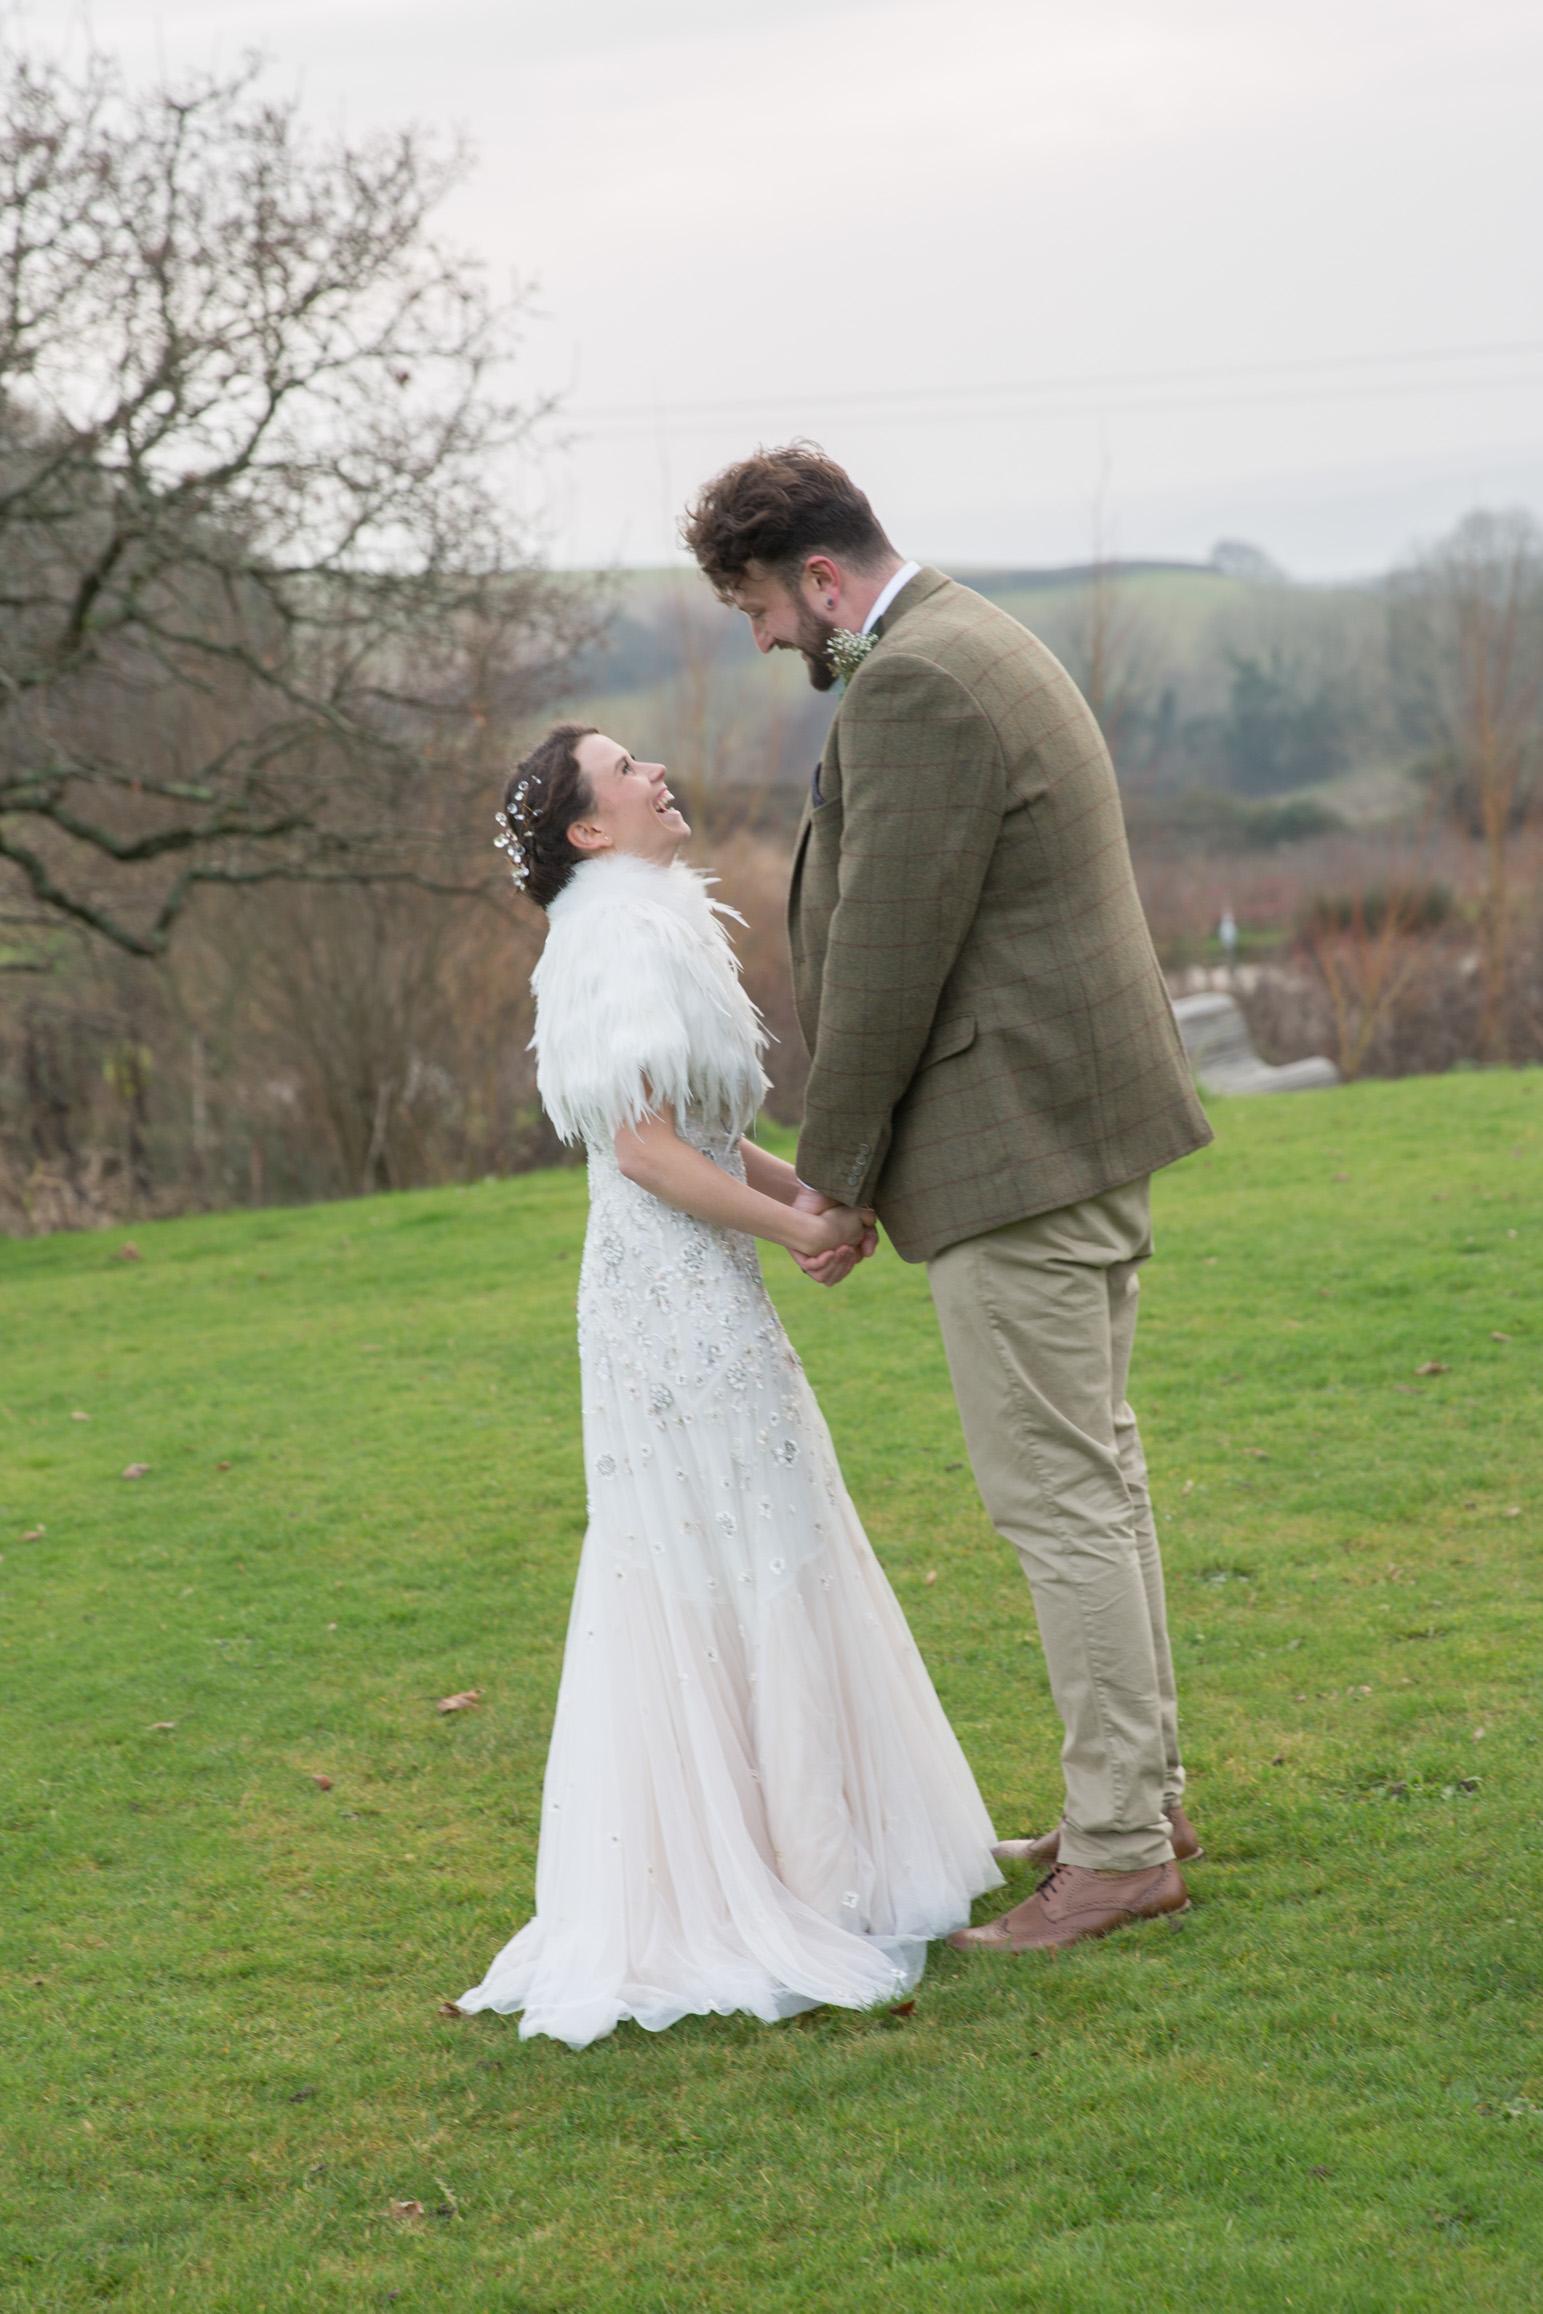 Jess & Ben - Bristol Wedding Photographer - Wright Wedding Photography - 113